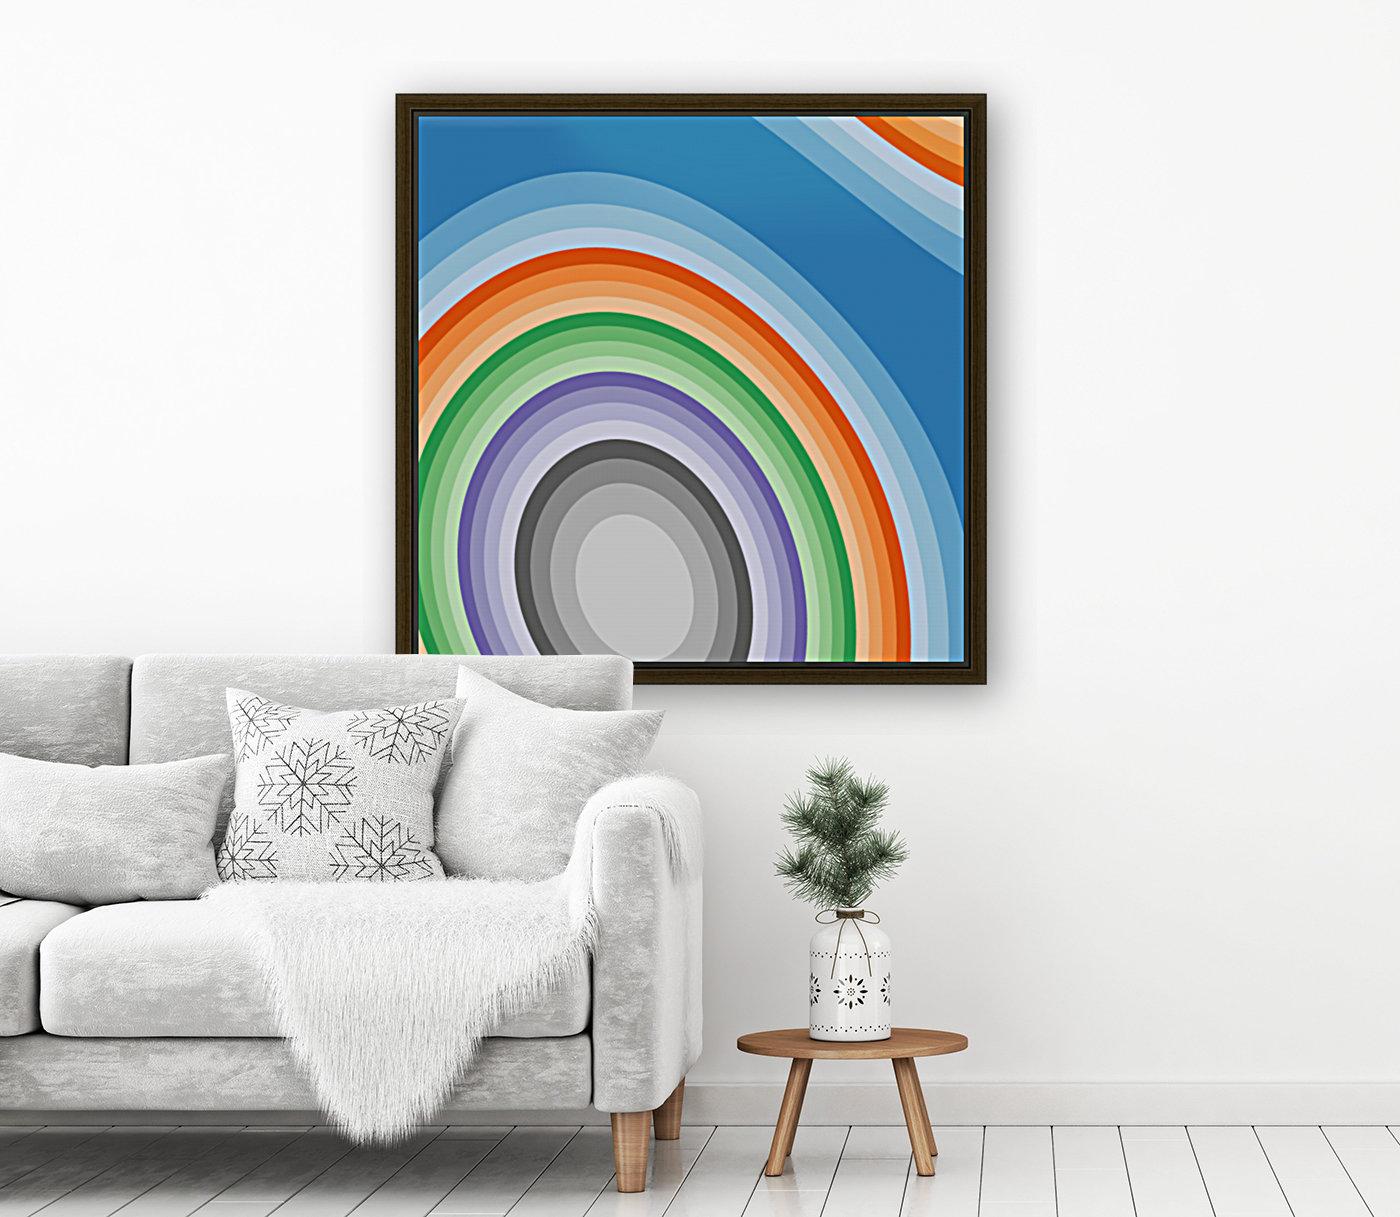 Abstract art (7)_1558001570.36  Art